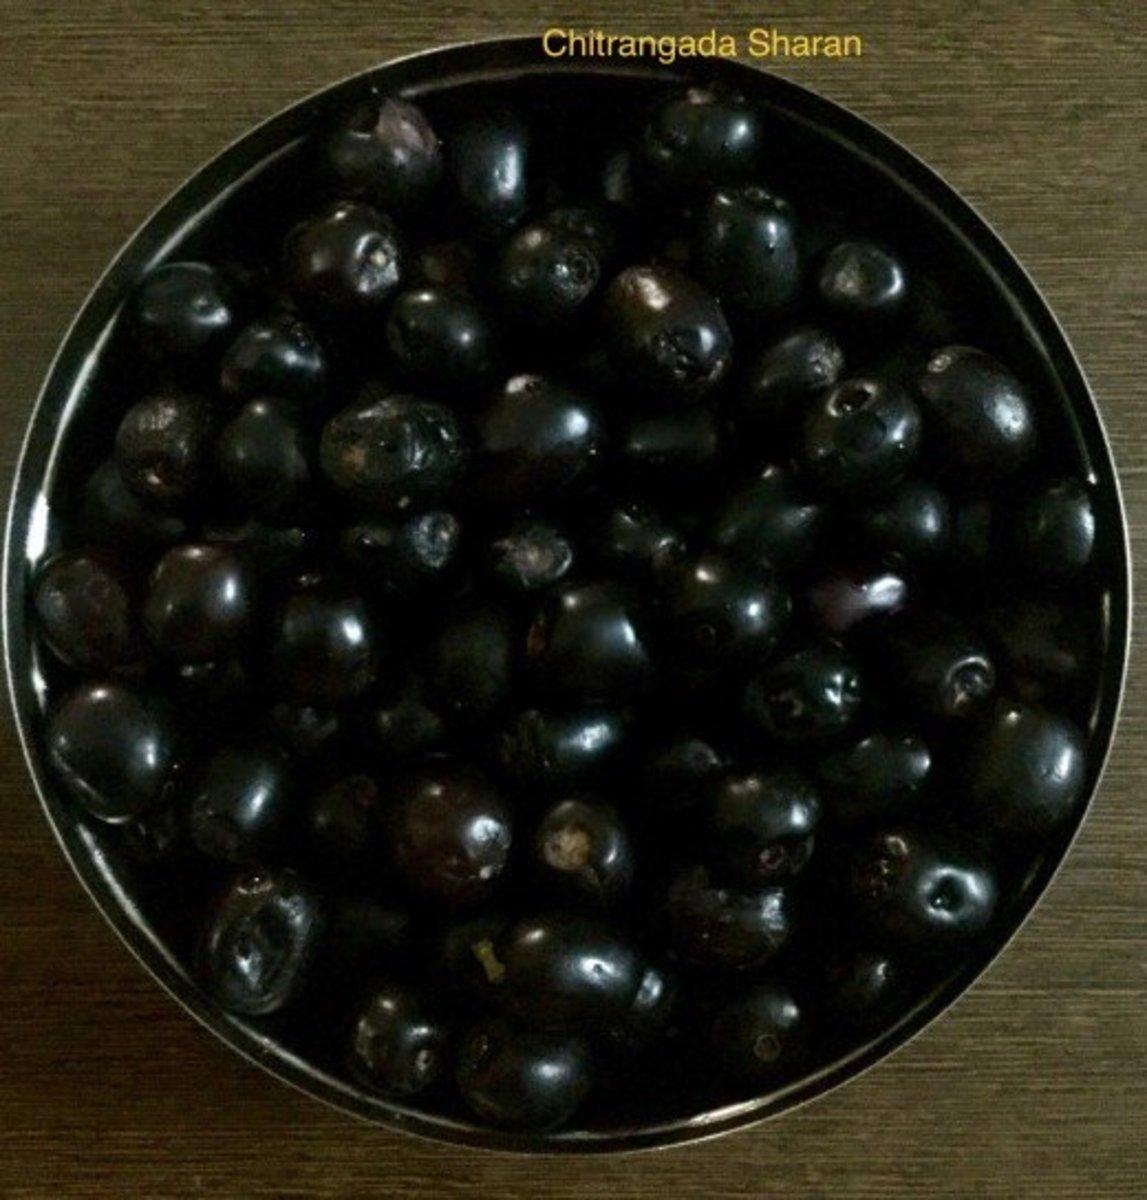 Antioxidant Rich Food: Blueberries